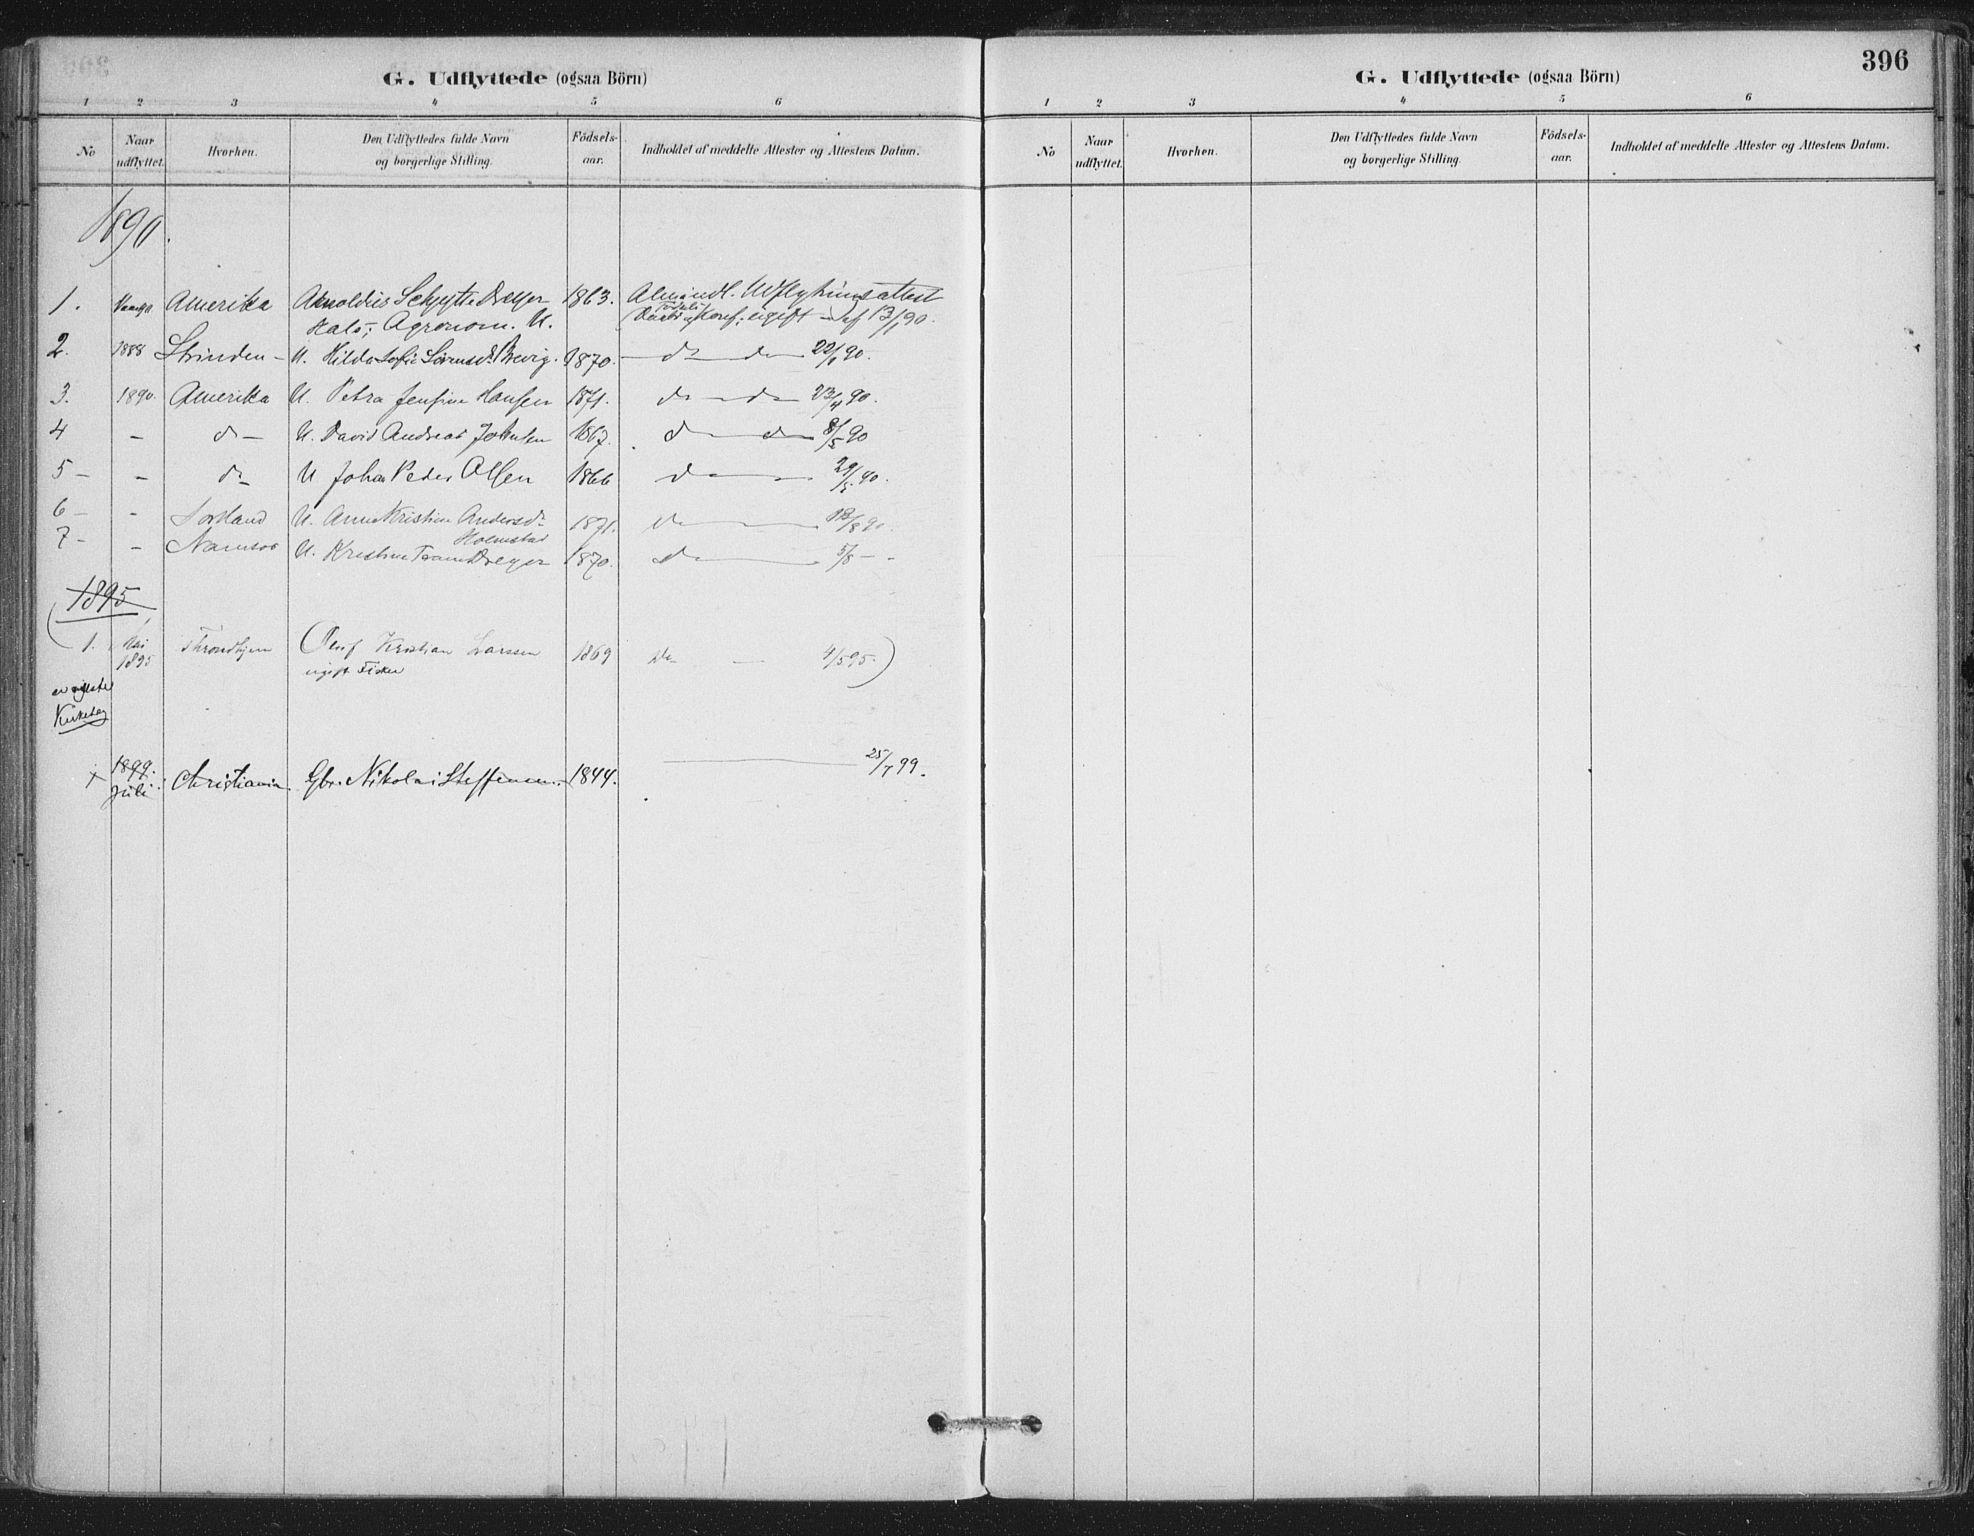 SAT, Ministerialprotokoller, klokkerbøker og fødselsregistre - Nordland, 888/L1244: Ministerialbok nr. 888A10, 1880-1890, s. 396